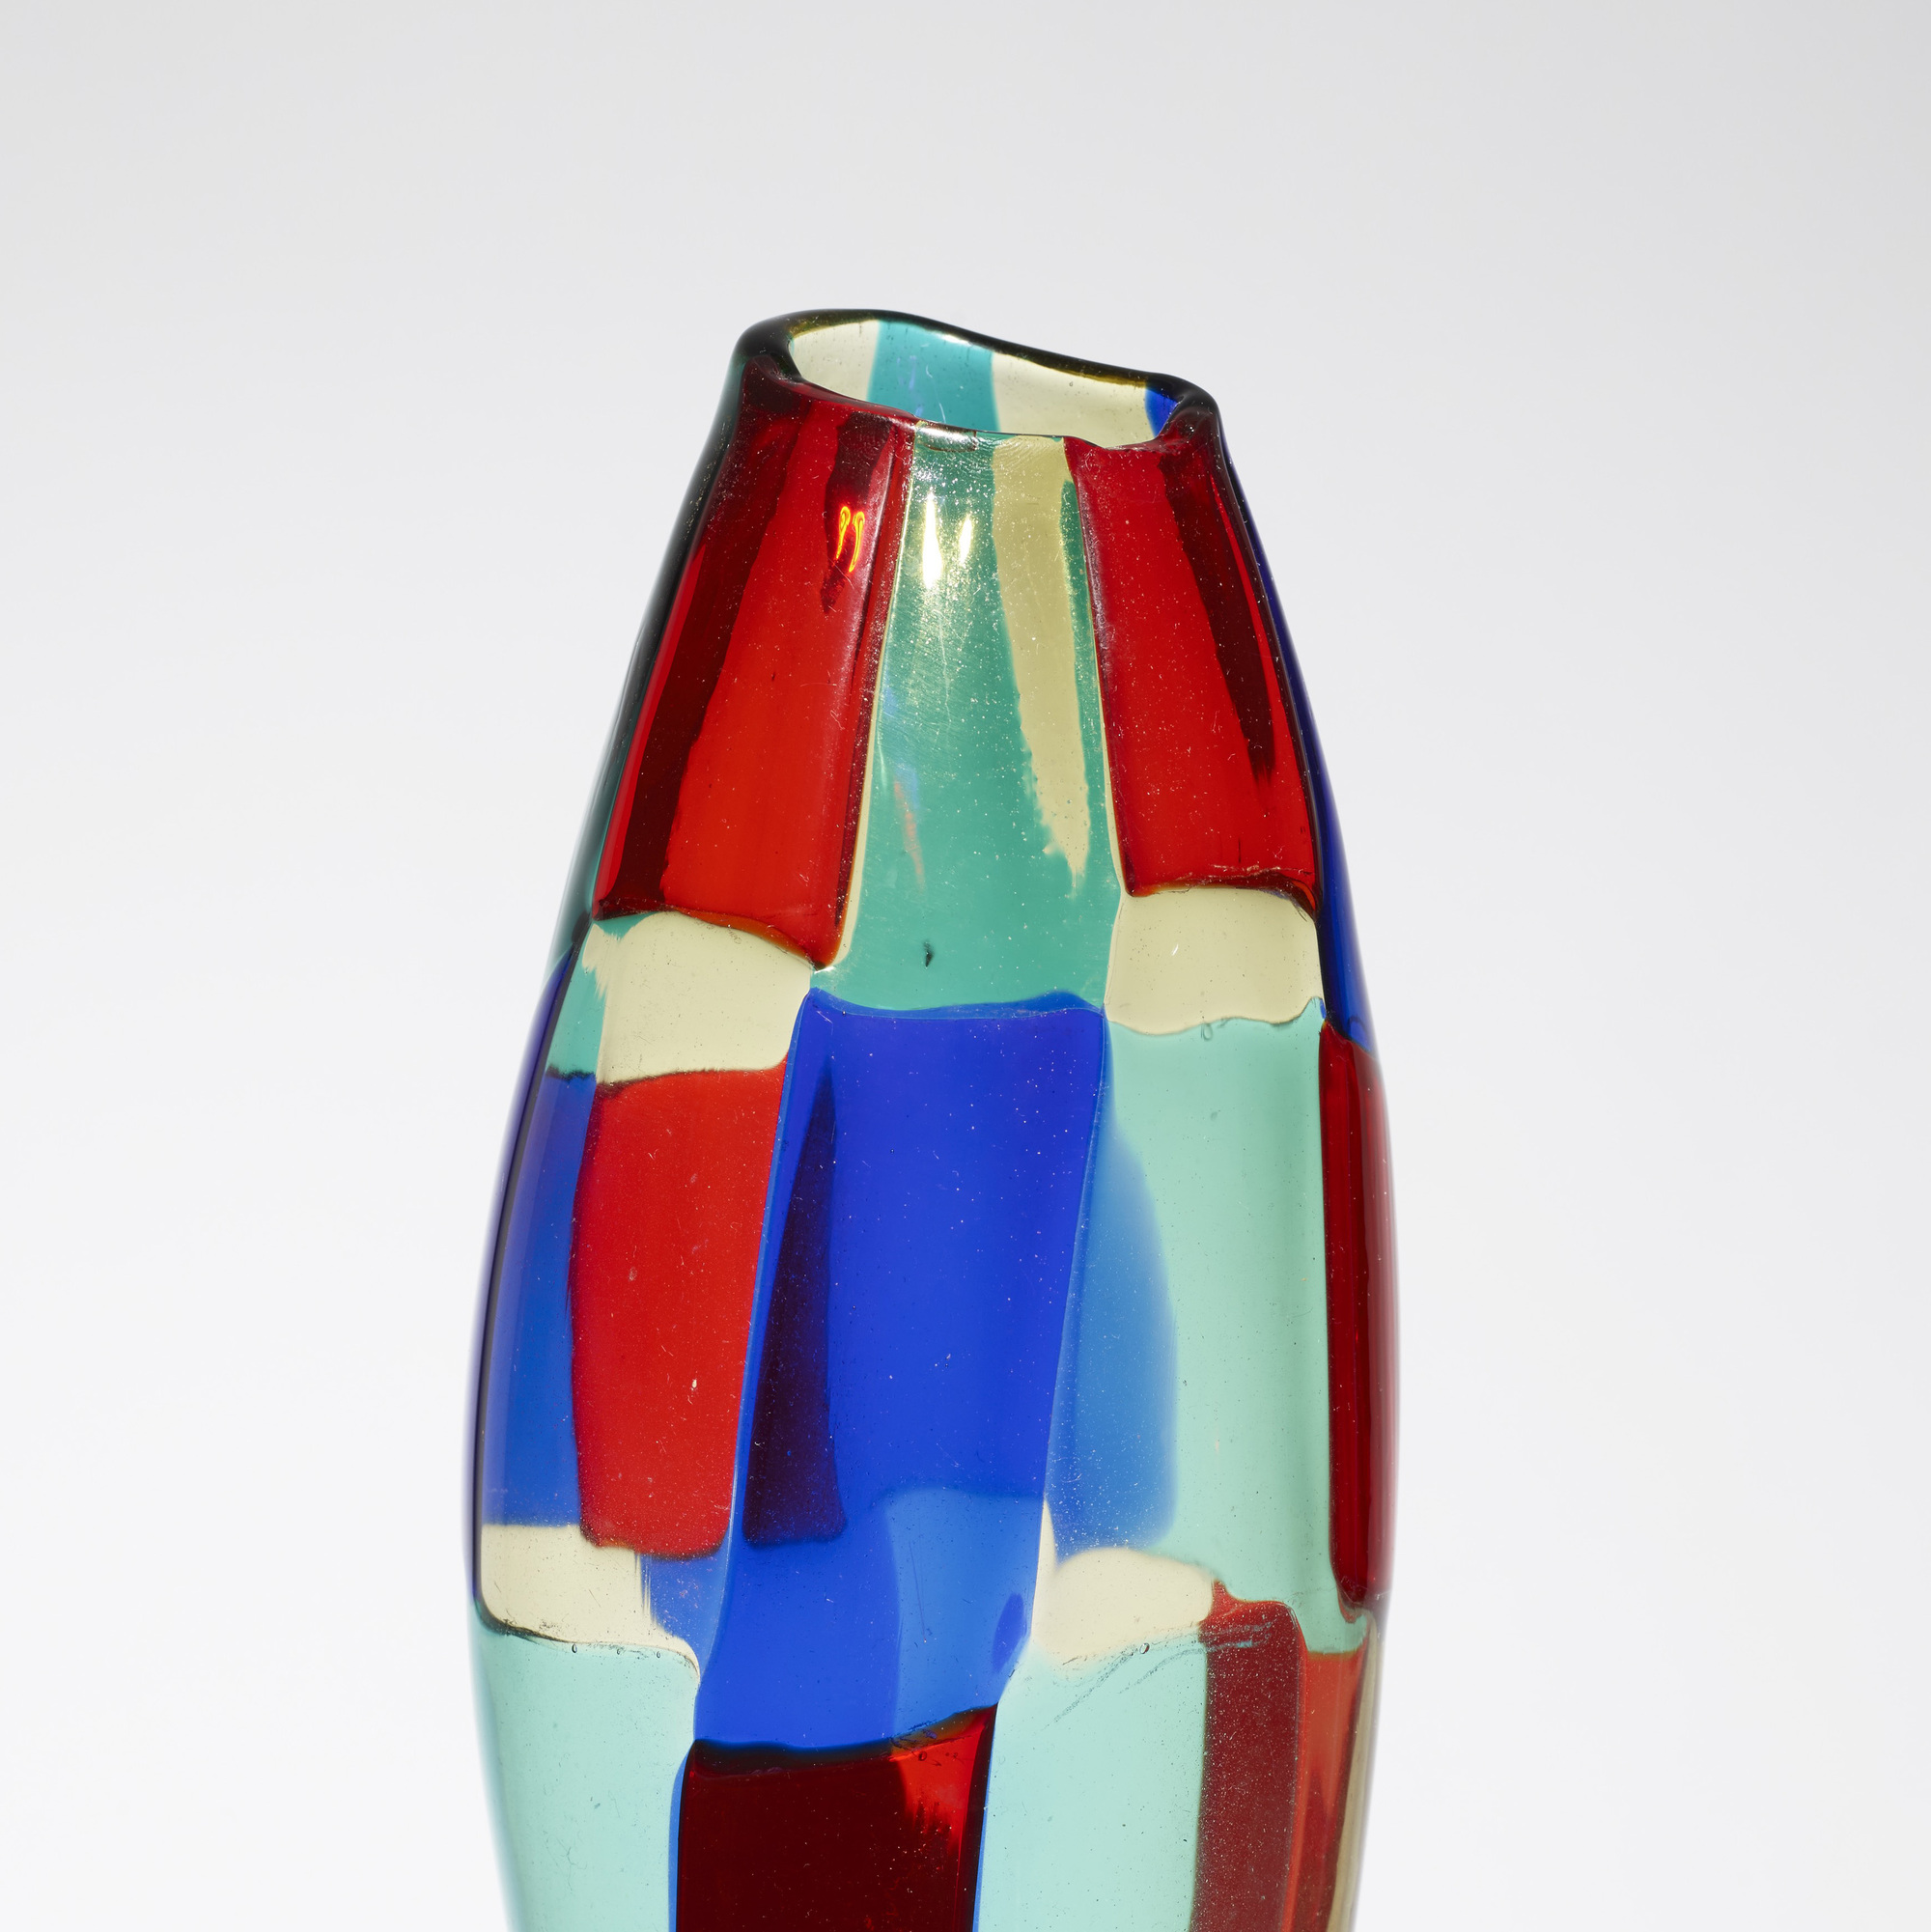 140: Fulvio Bianconi / rare Pezzato vase (3 of 3)